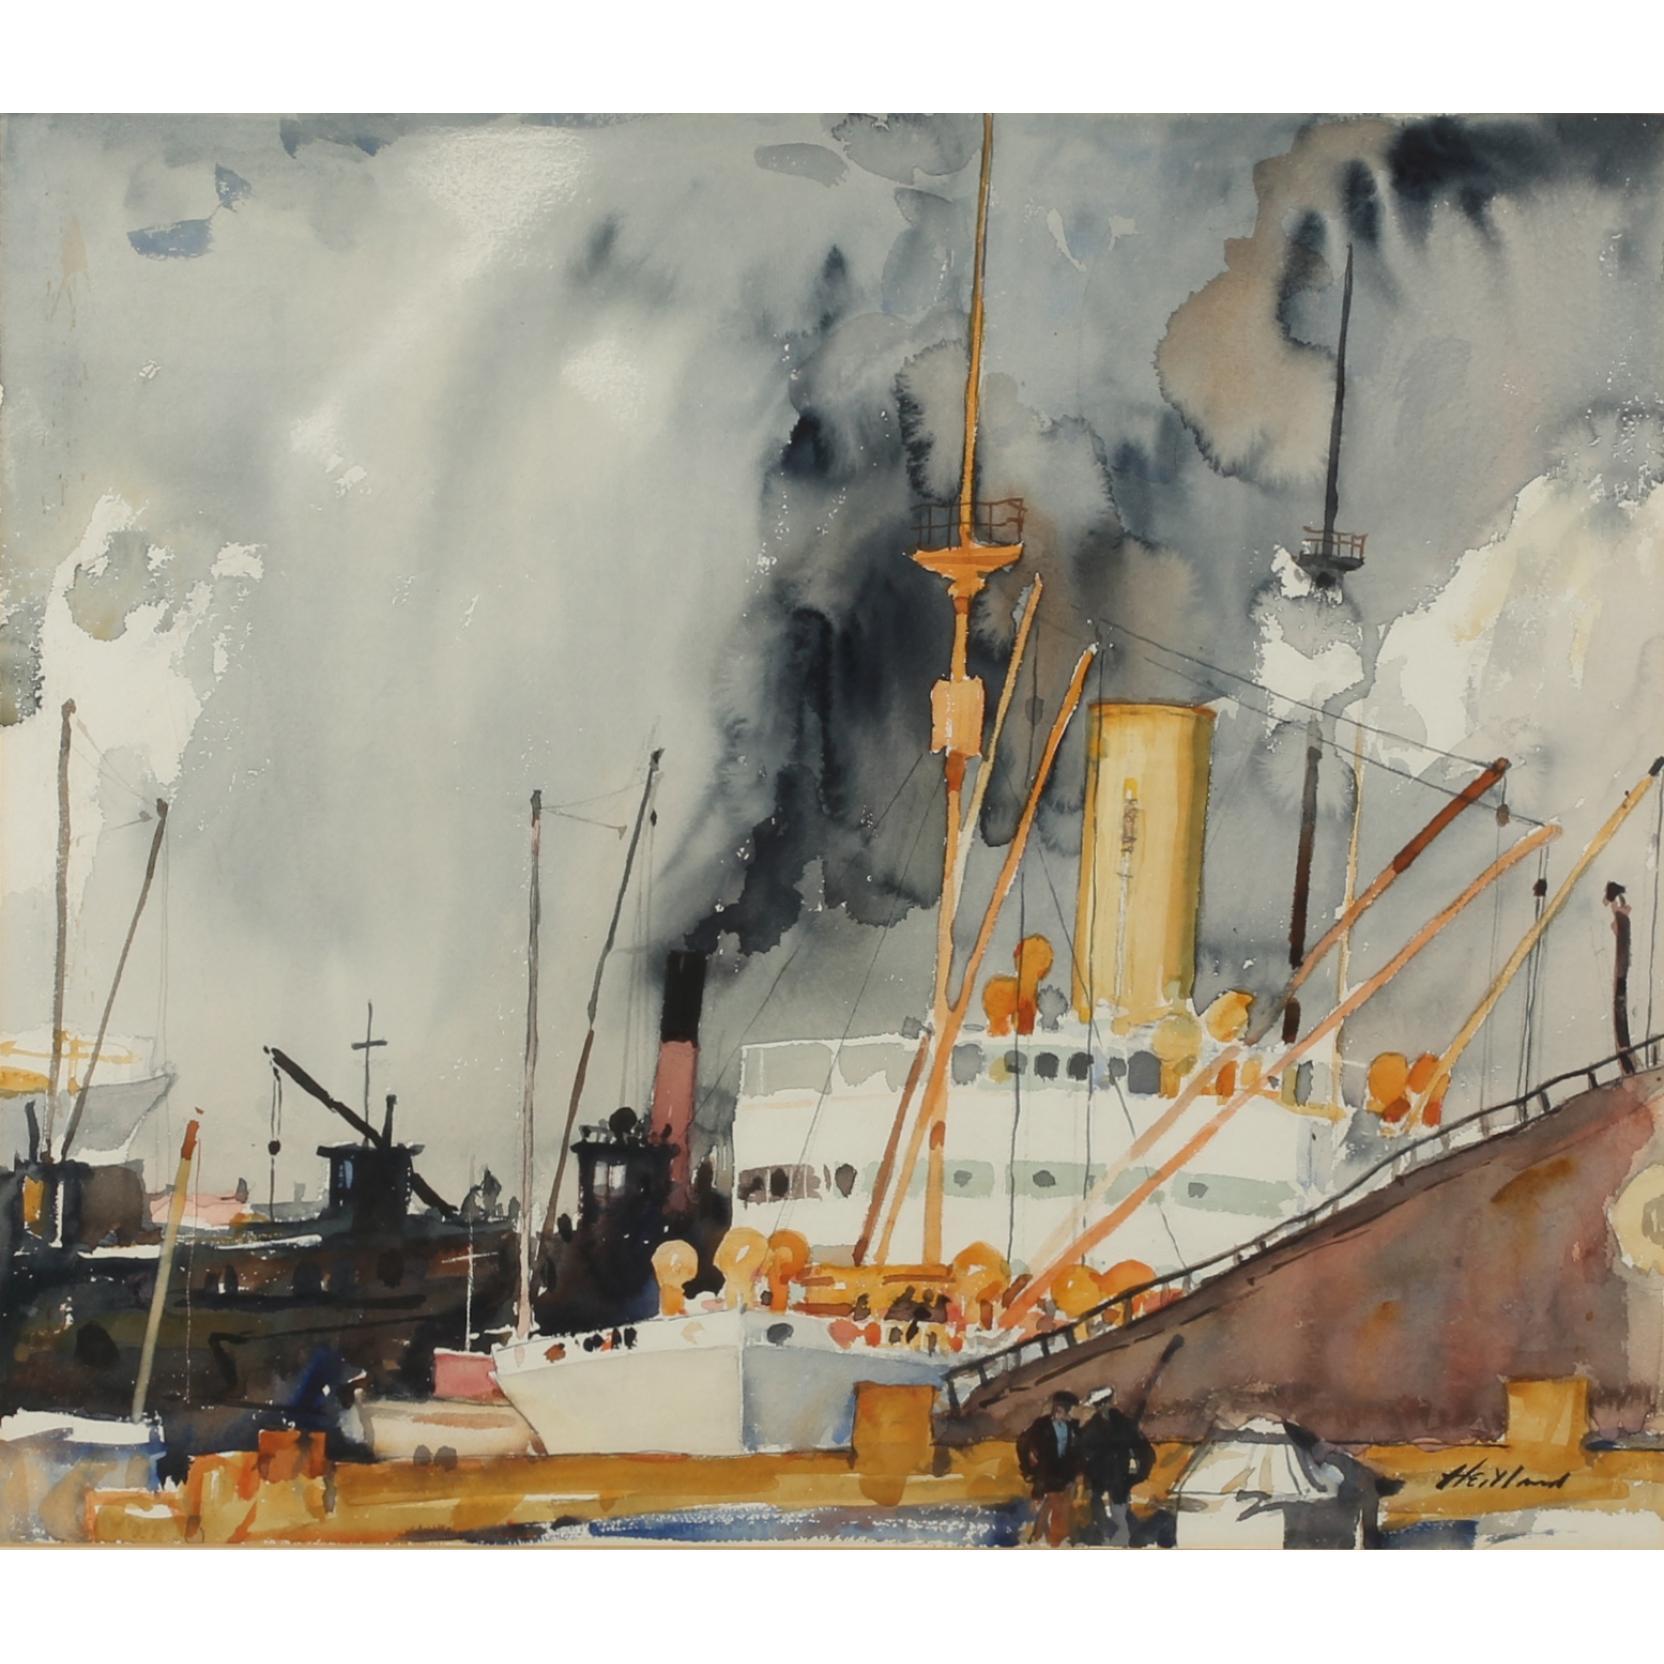 wilmot-heitland-1893-1969-cargo-from-the-orient